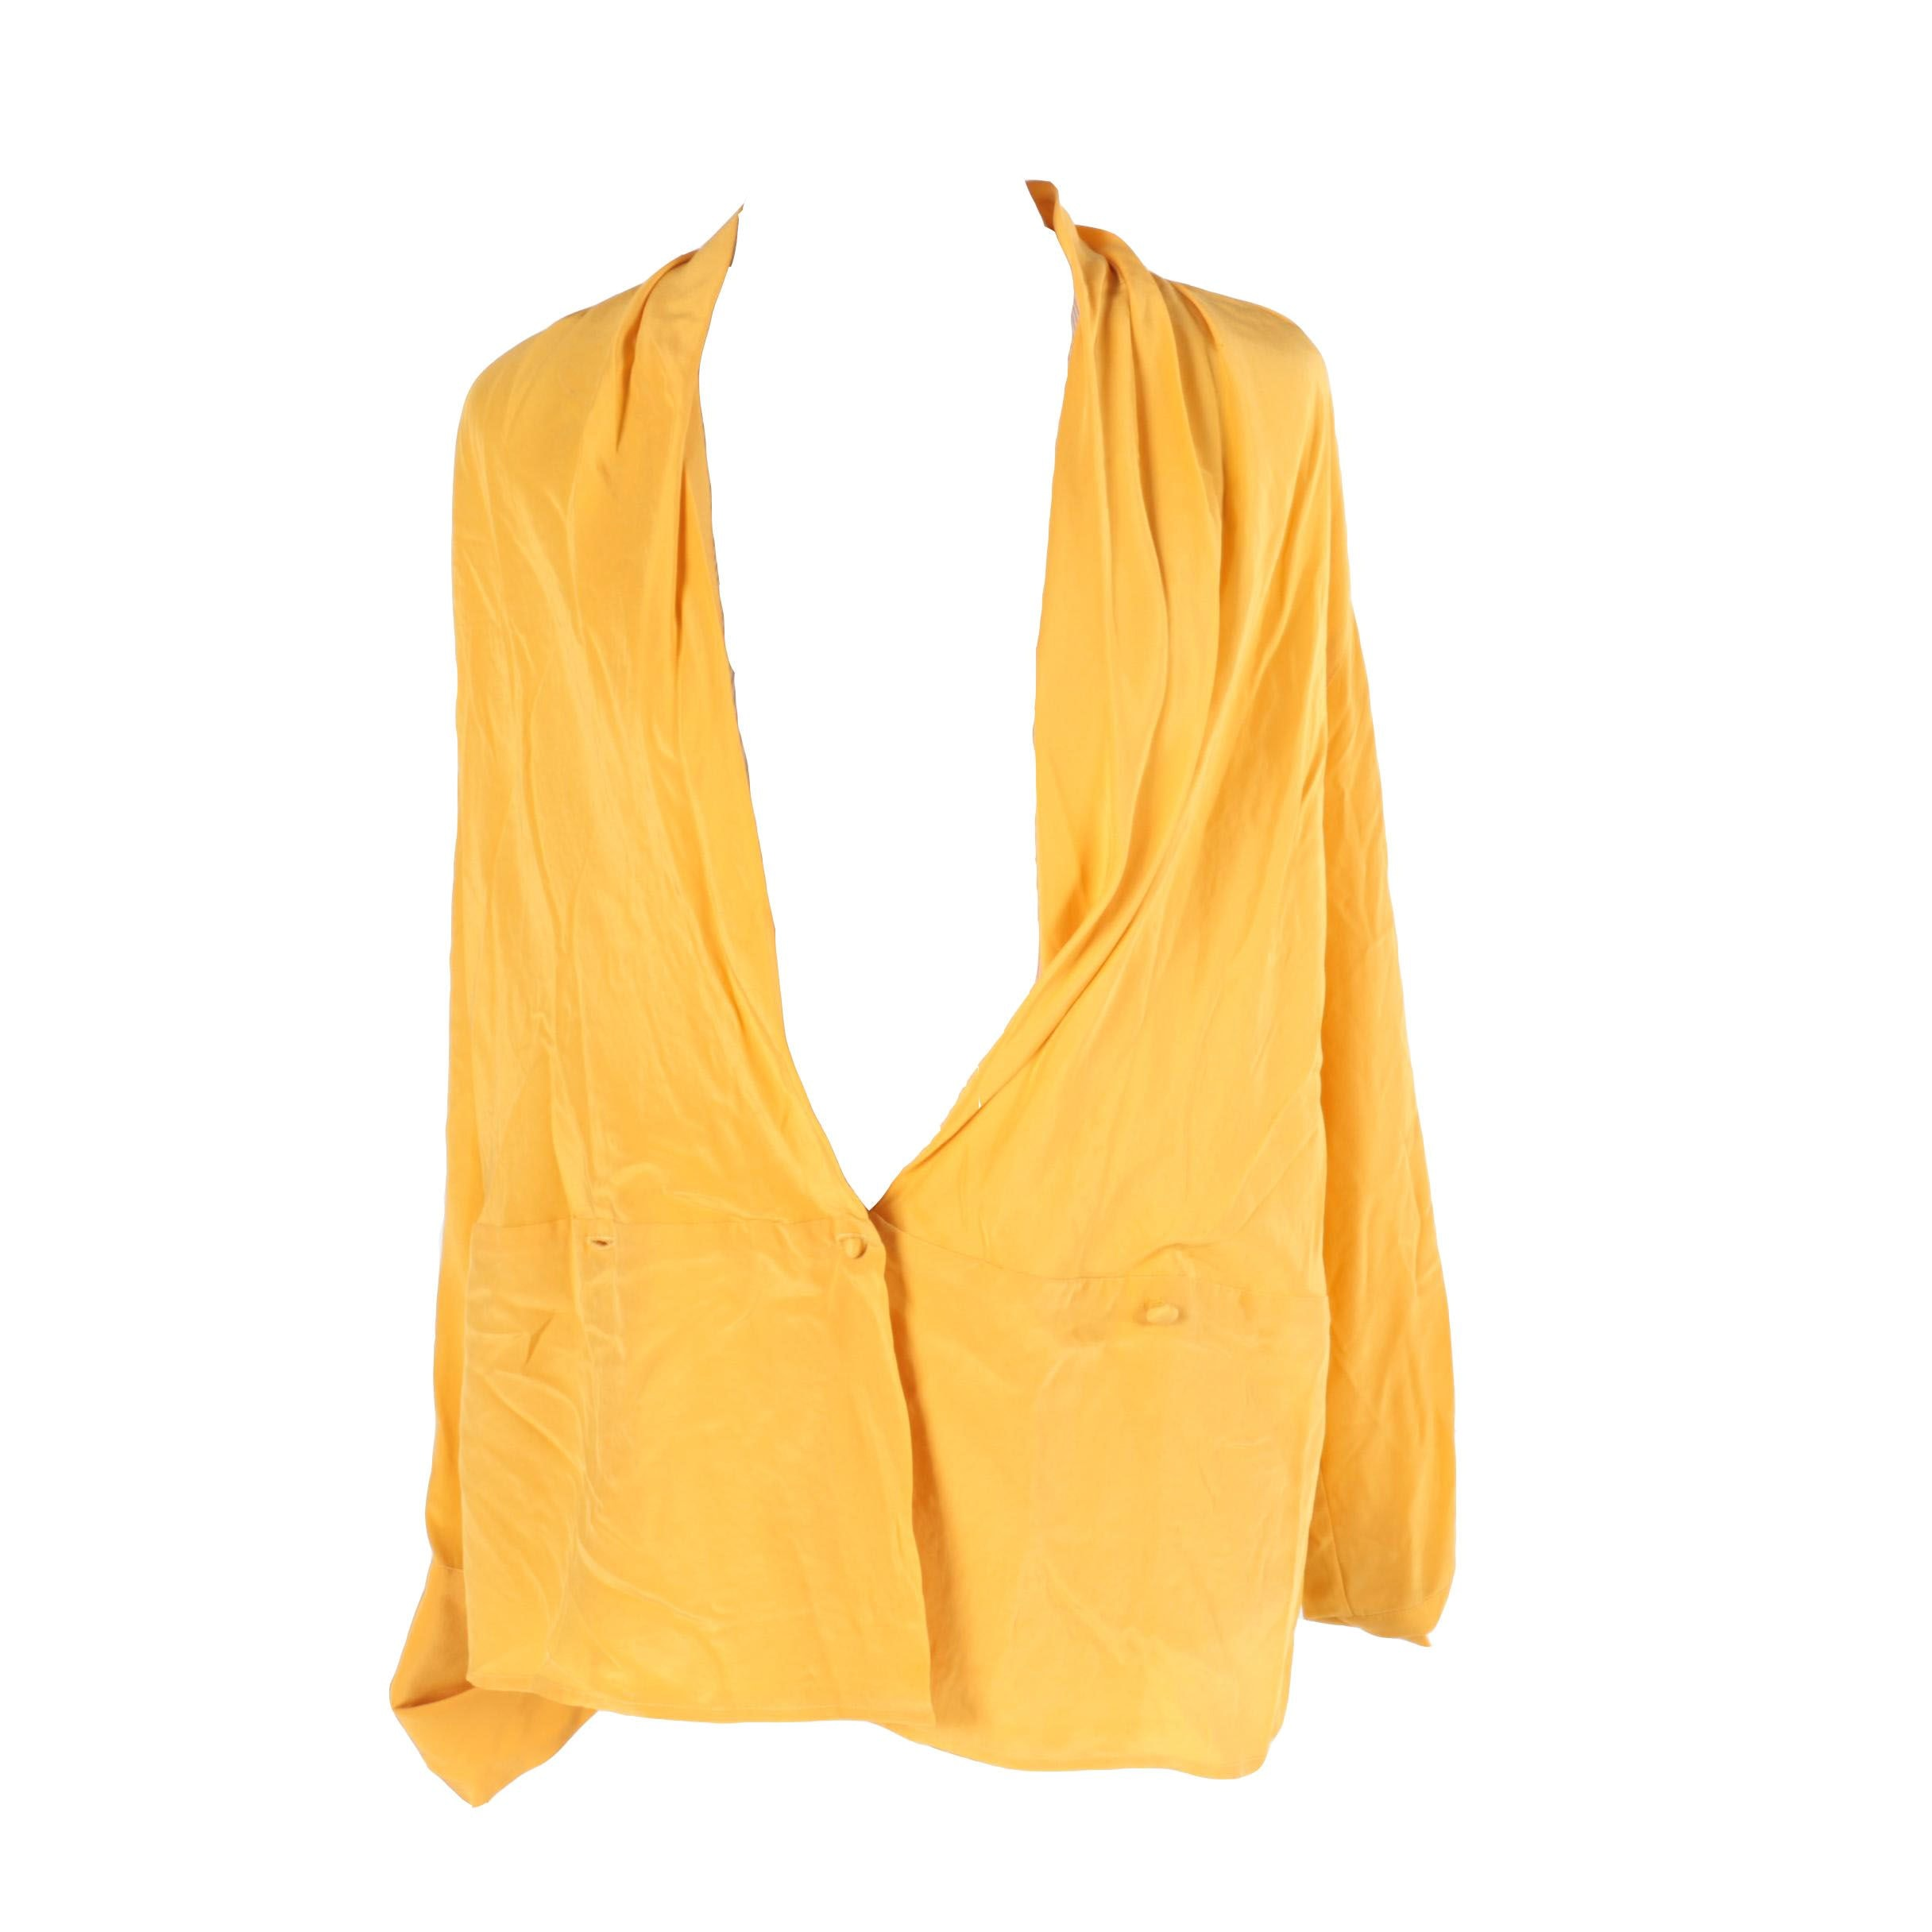 Christian Dior Silk Jacket